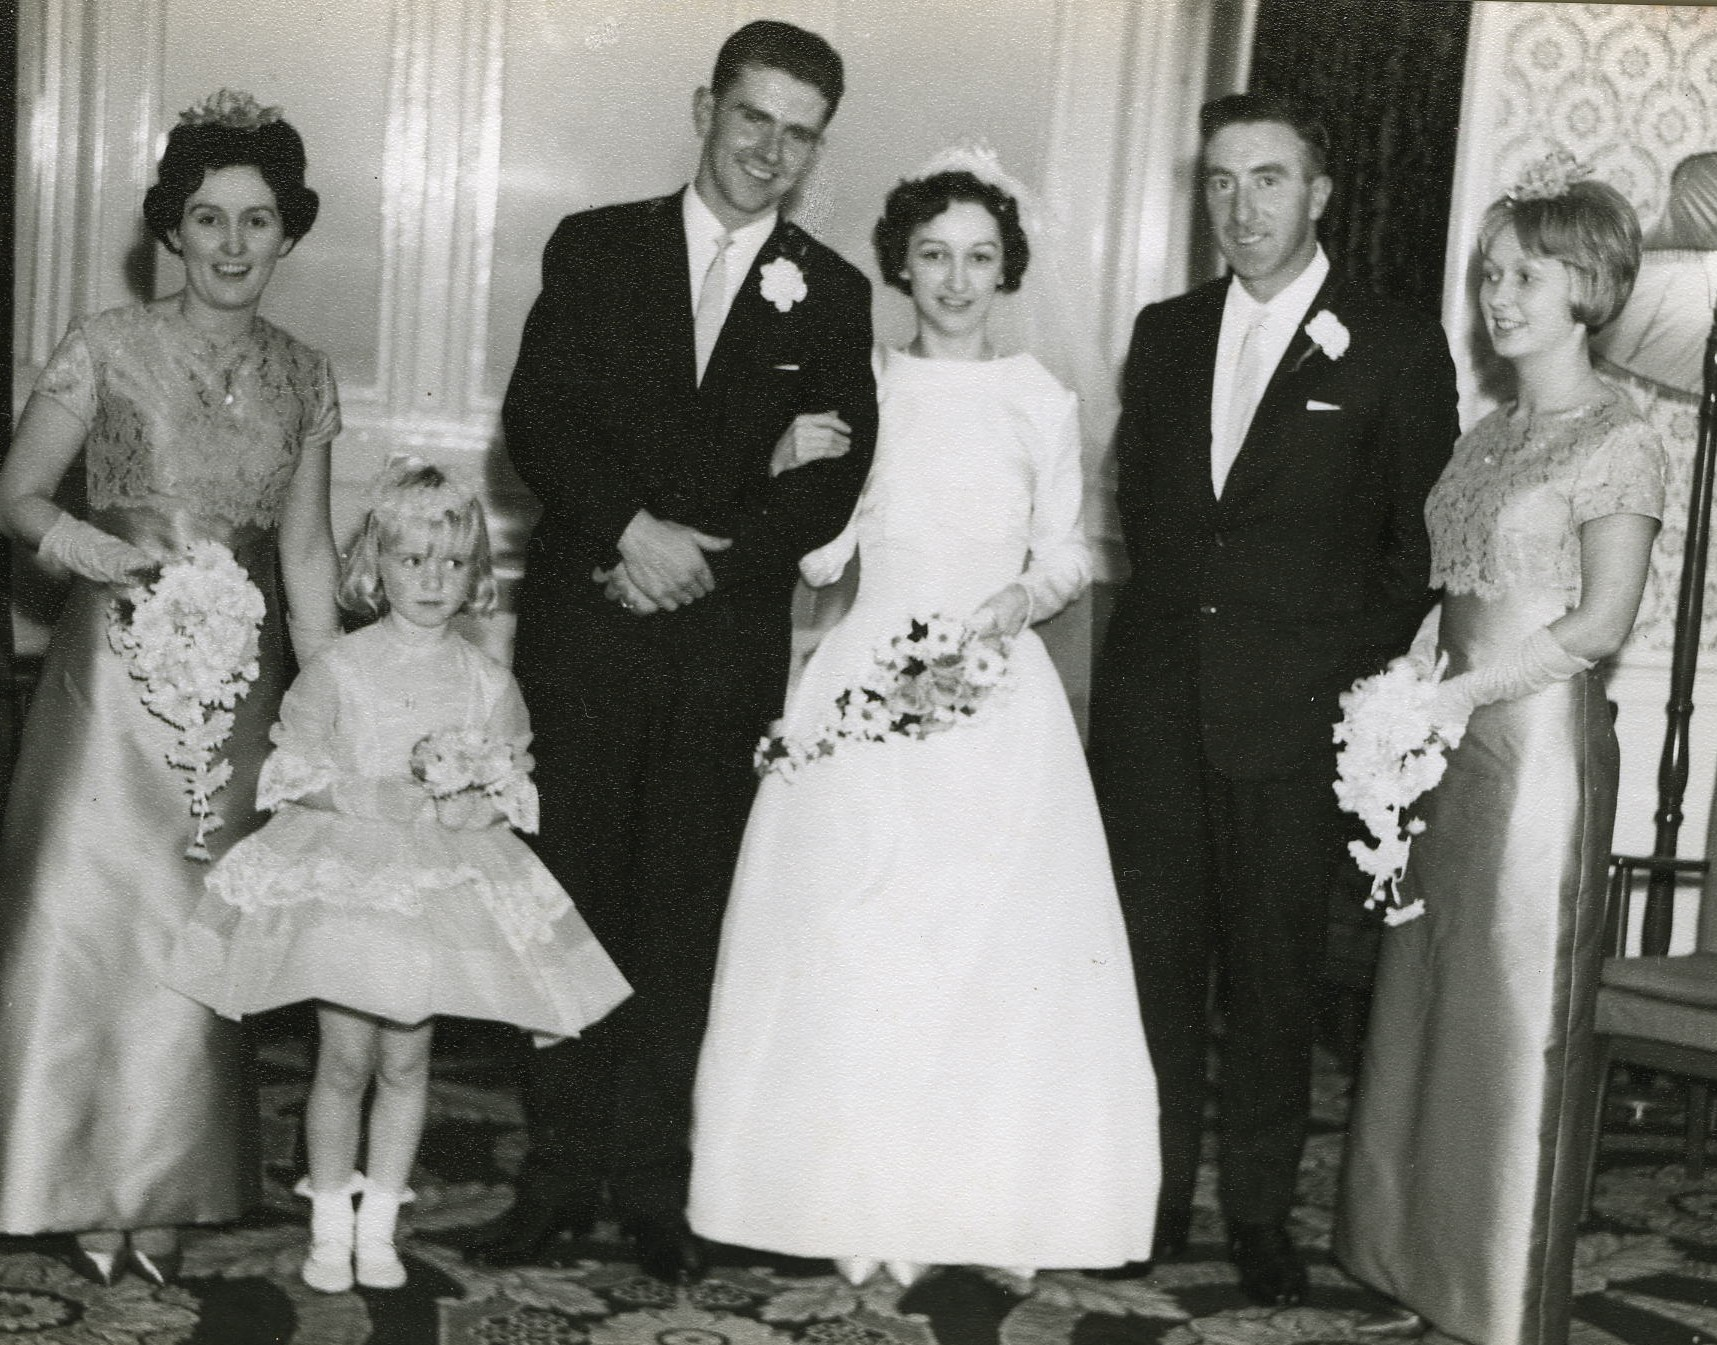 Michael Griffin & Christabel MacDiarmid's Wedding